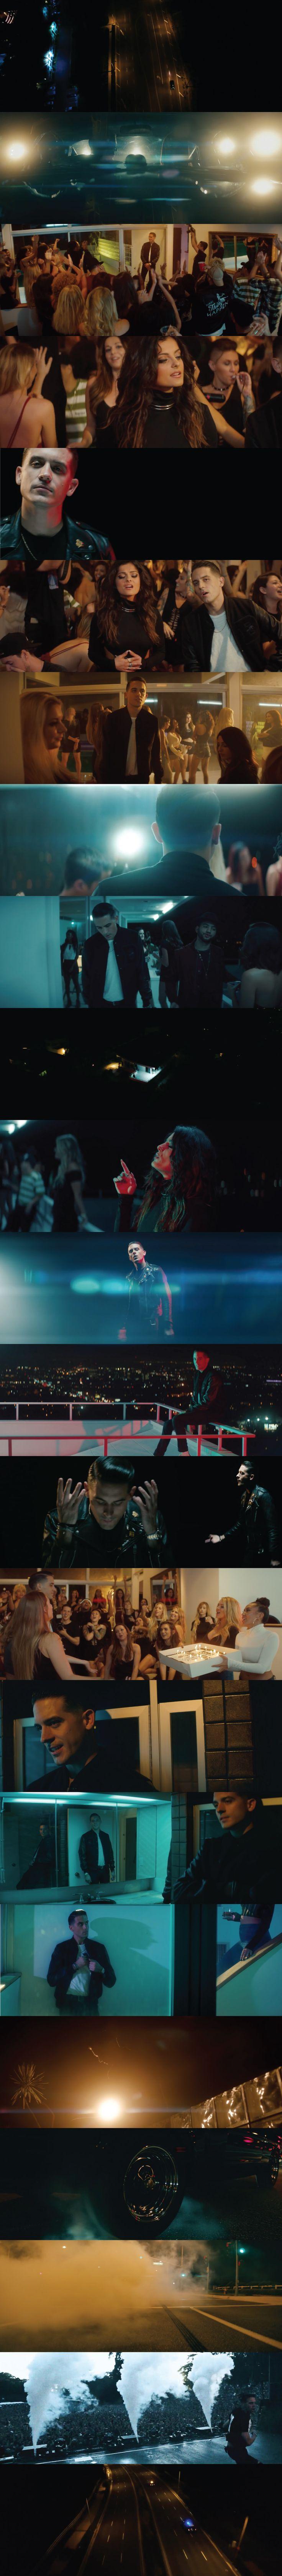 G-Eazy - Me, Myself & I